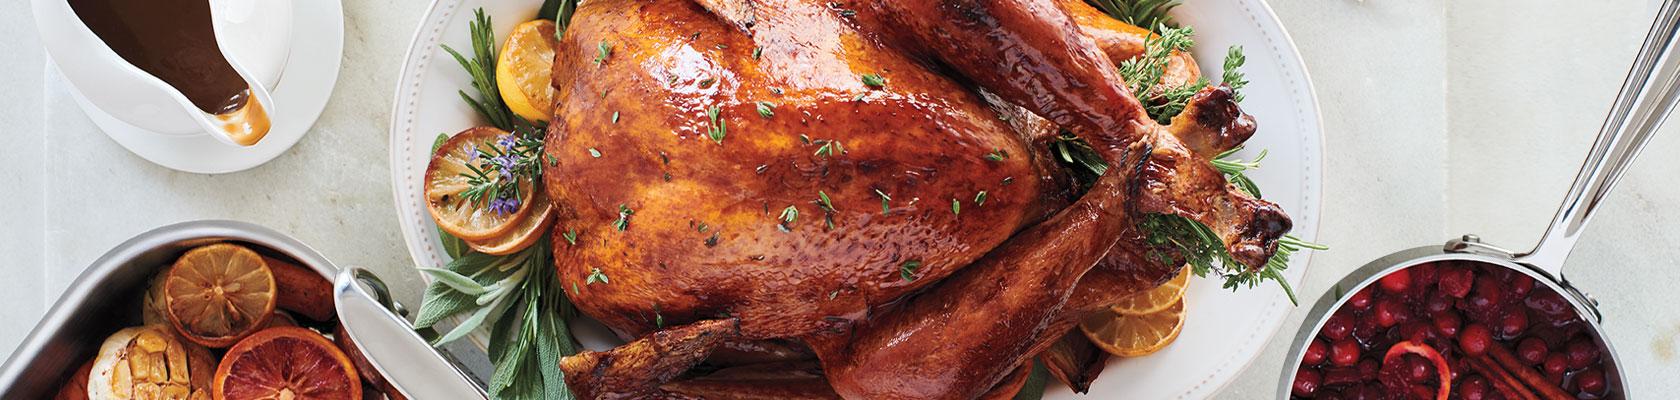 Roasted turkey on white oval Pearl platter